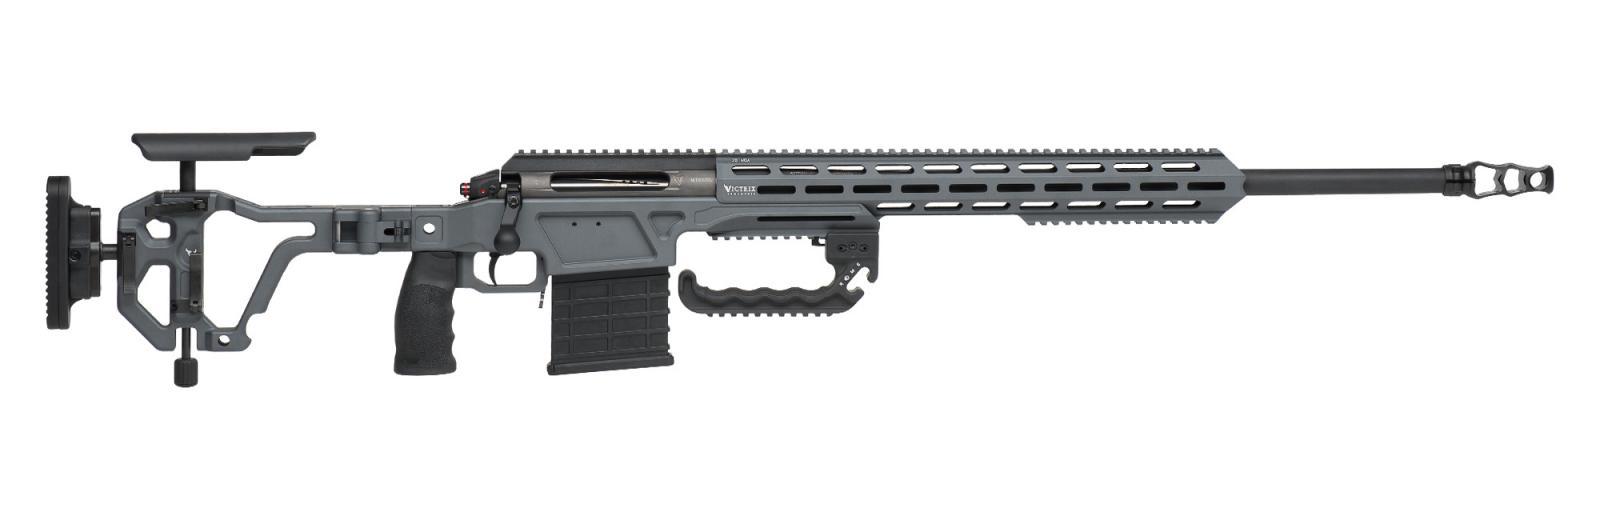 "Carabine a repetition VICTRIX Scorpio V Gris 26"" Cal. 338 LAPUA"